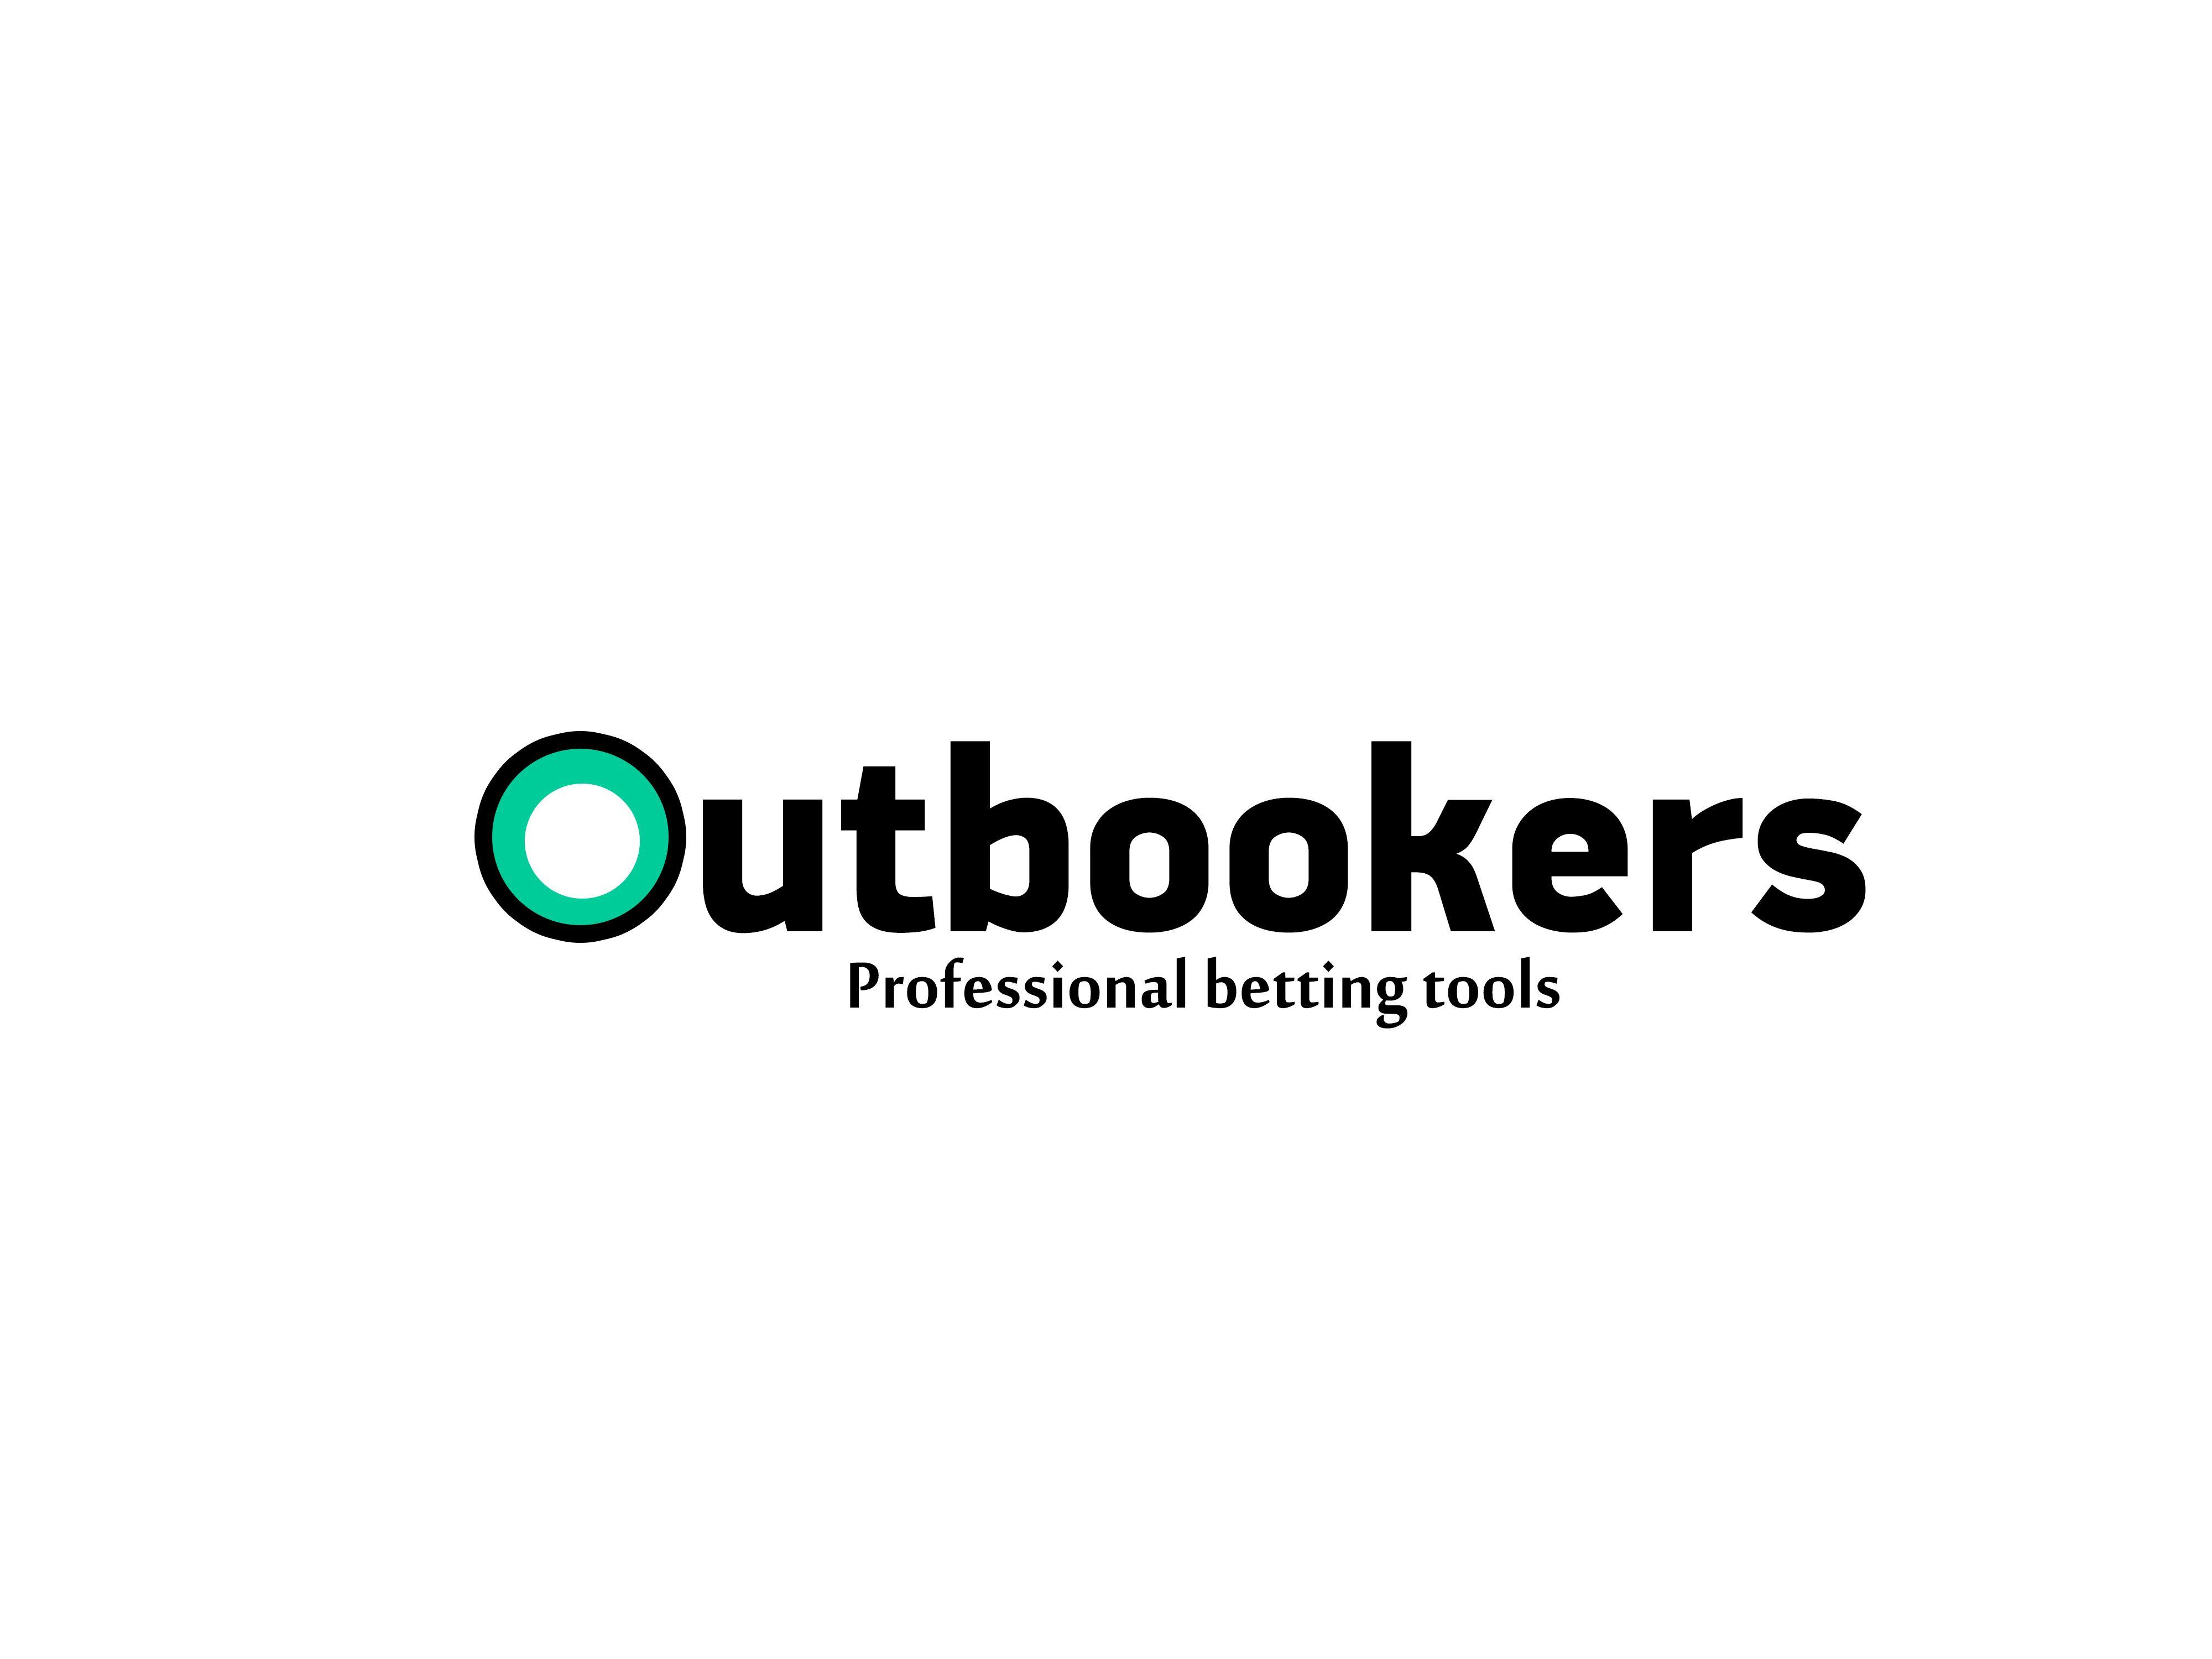 Логотип для компании (спортивная аналитика) - дизайнер optimuzzy